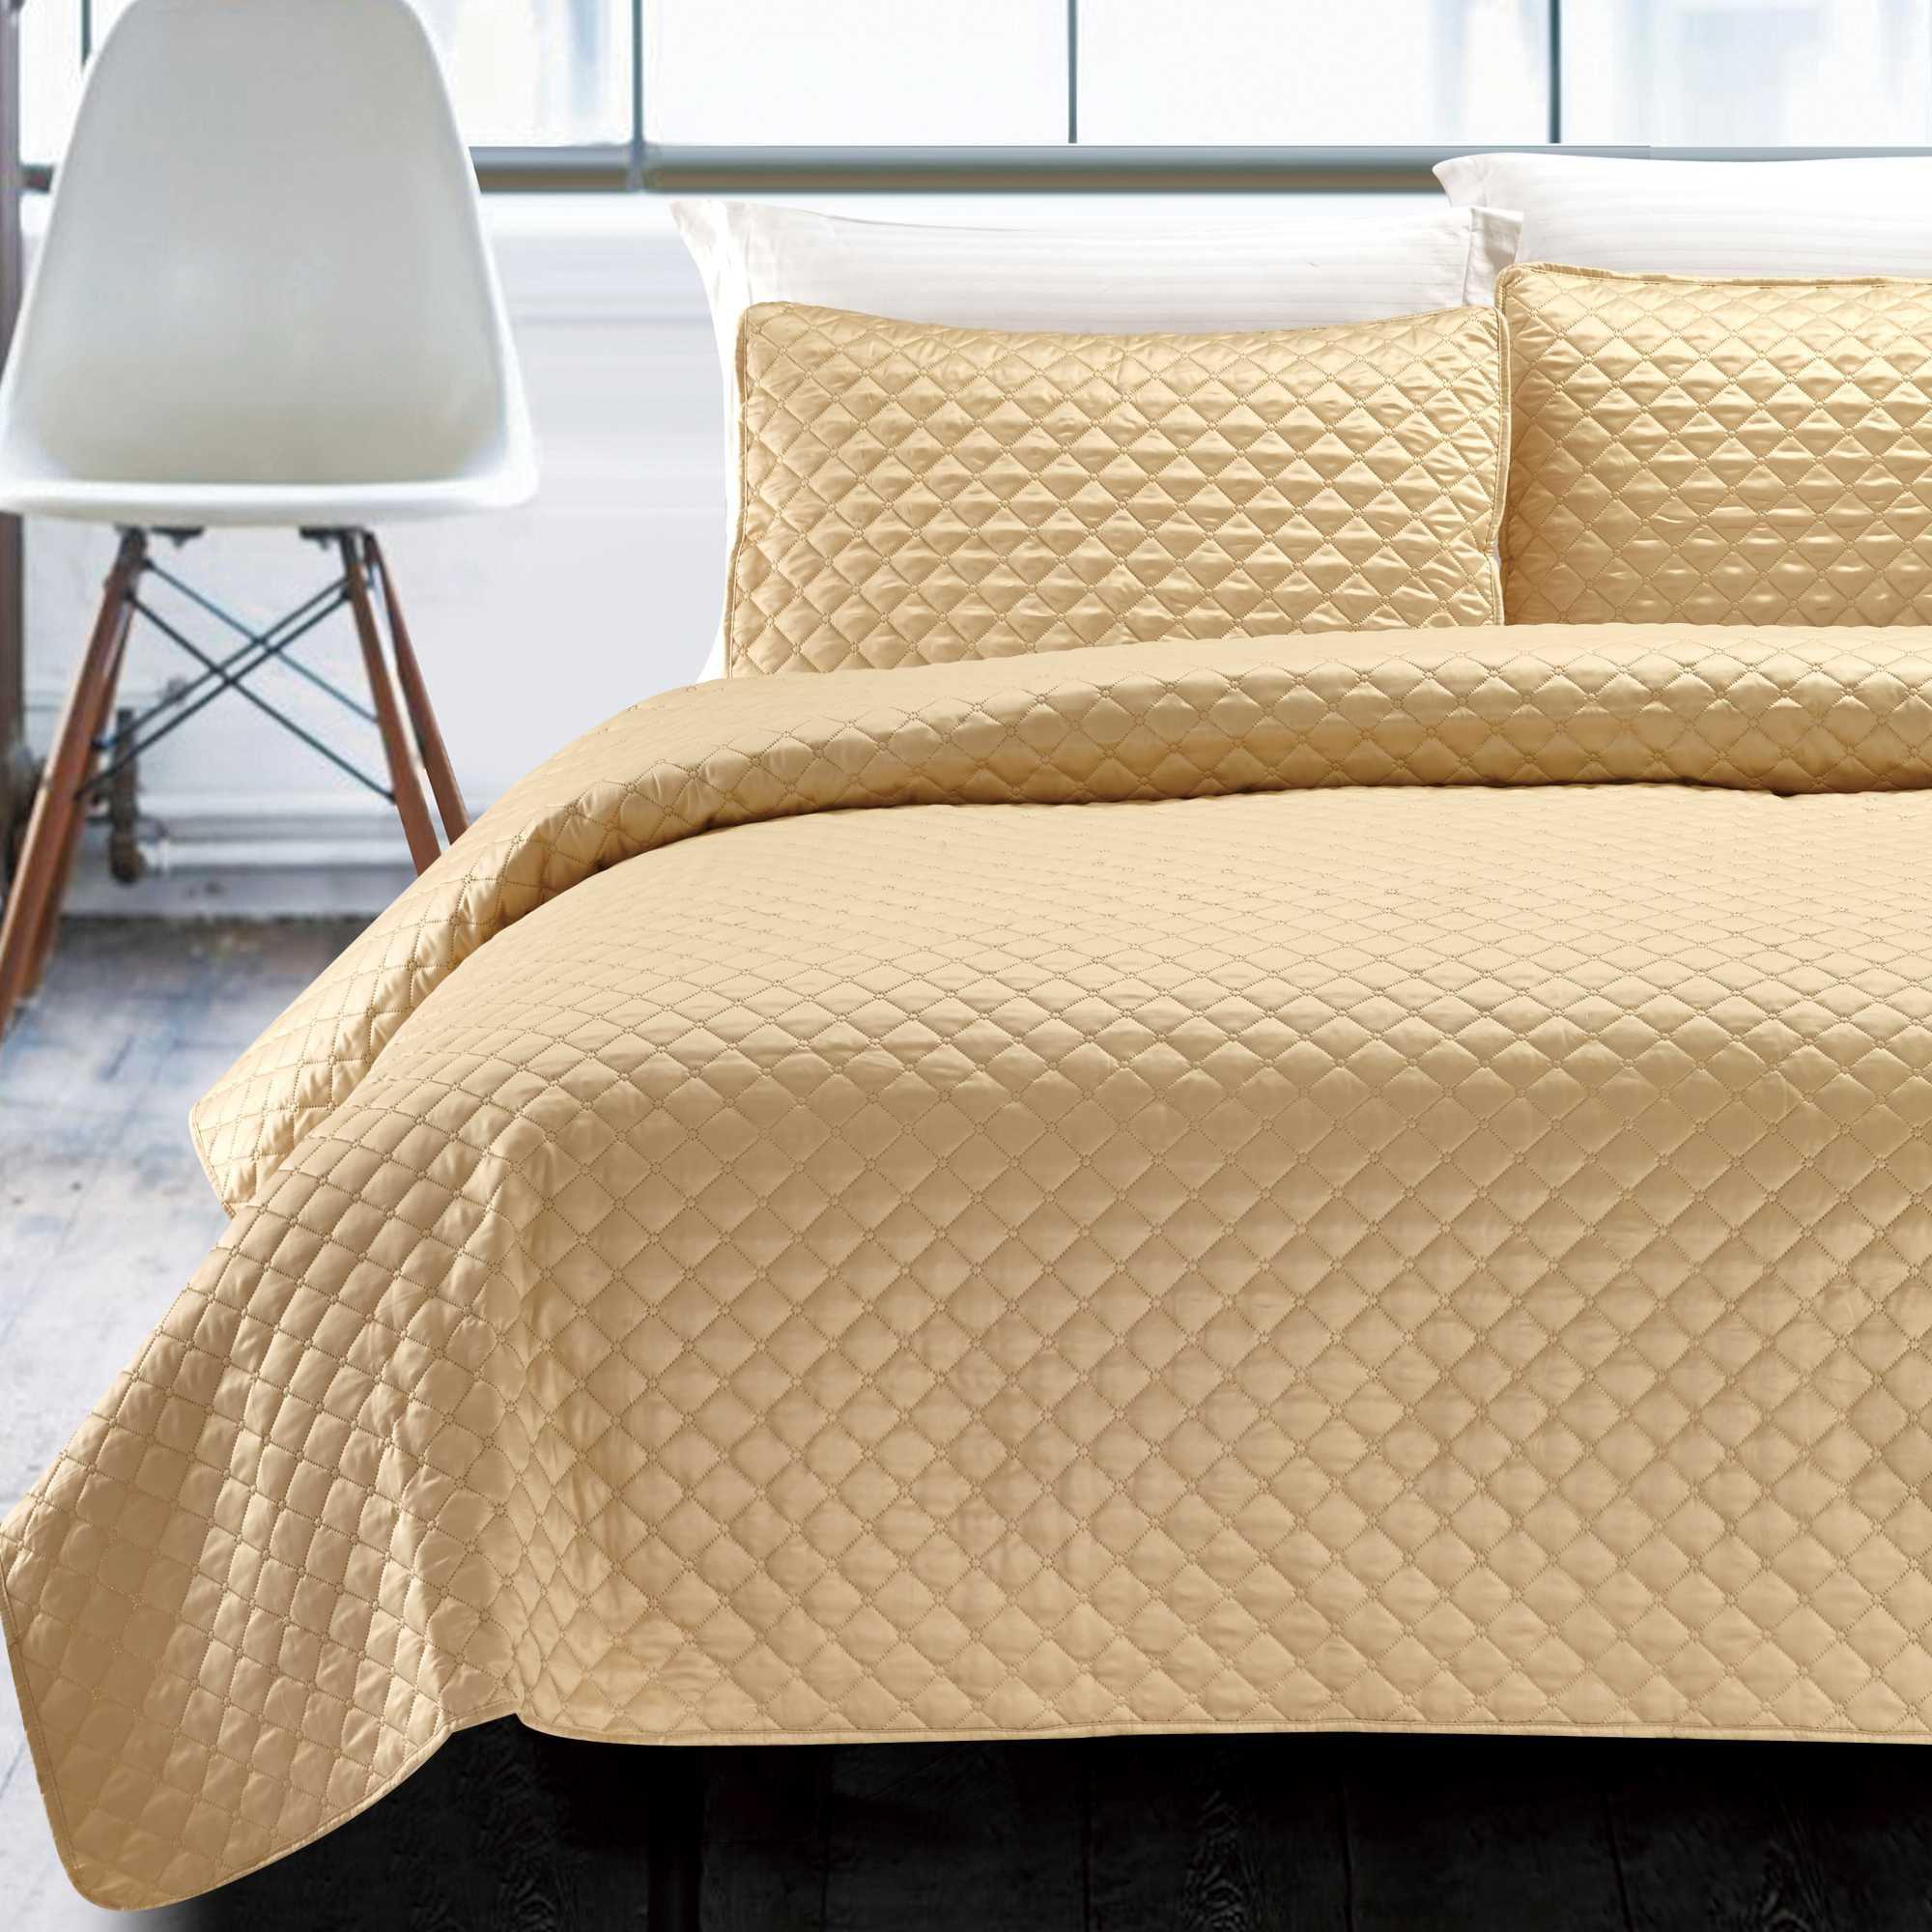 California Design Den Hotel Diamond Luxury White, King 3-Piece Coverlet Set